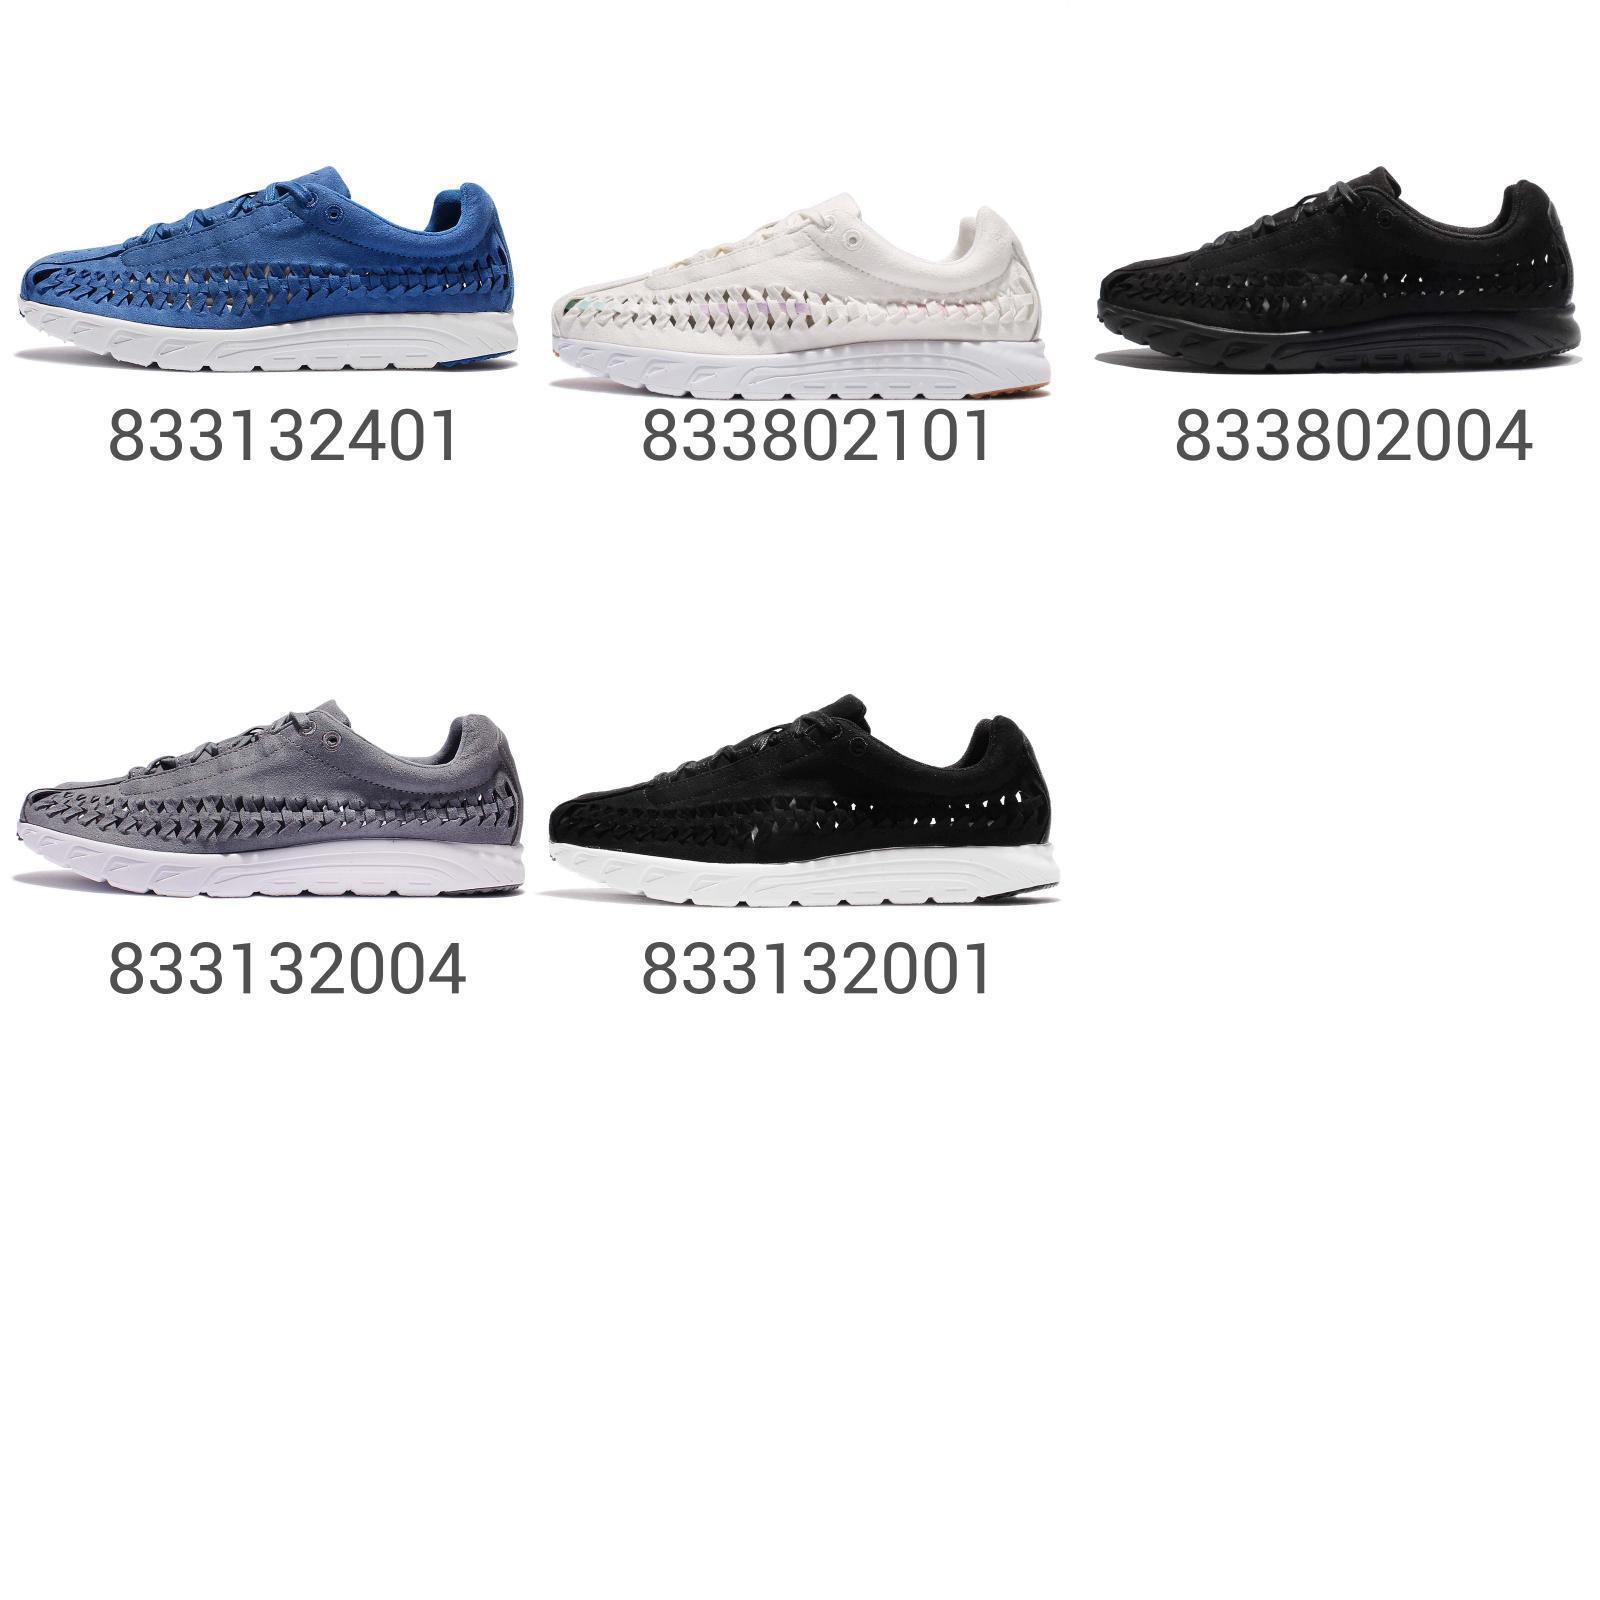 Nike Mayfly Woven Uomo Donna Lifestyle Shoes Sportswear NSW  Pick 1